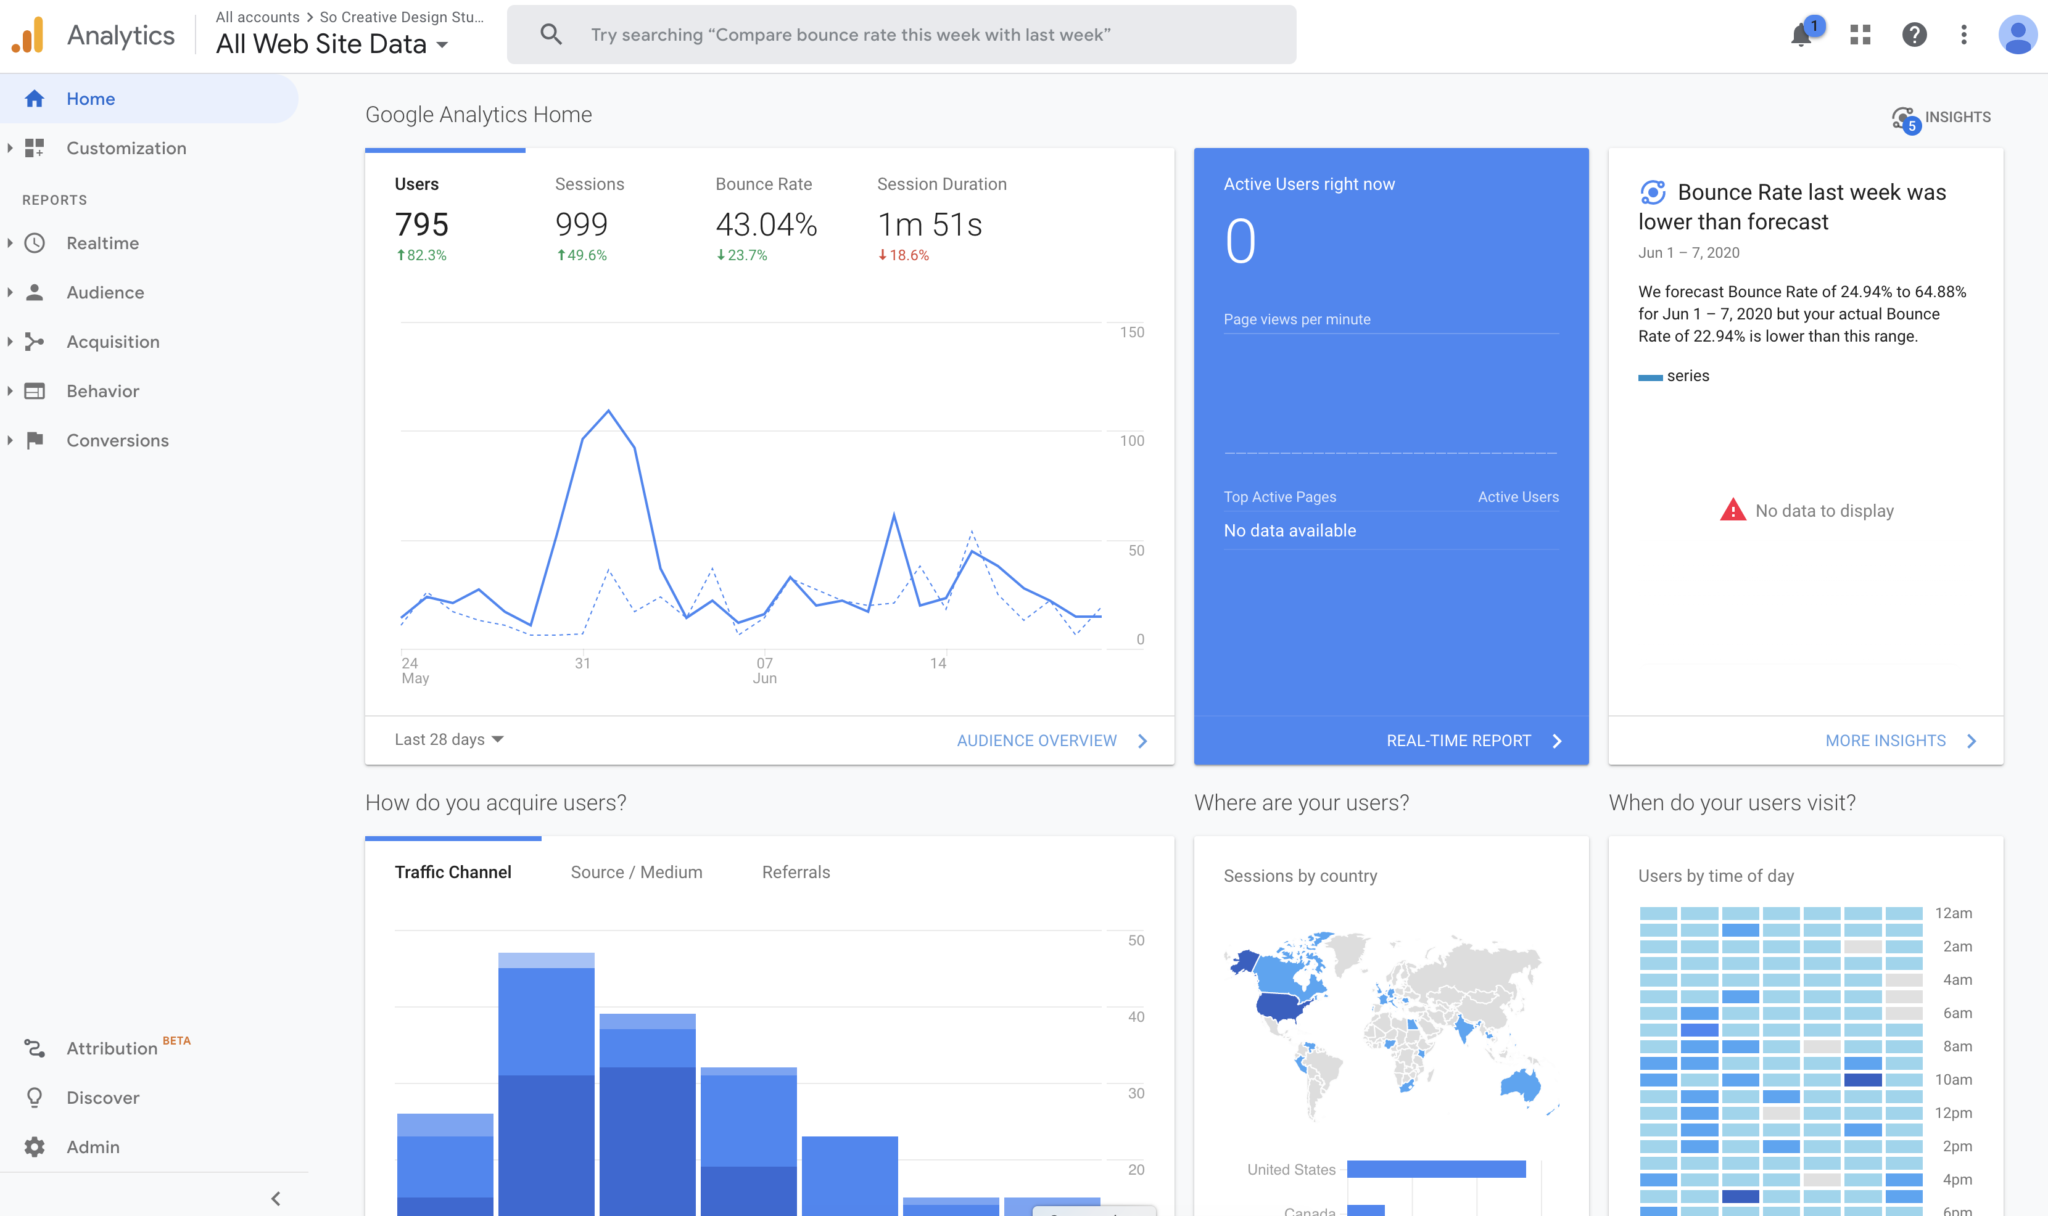 Google Analytics Content Creation Tools